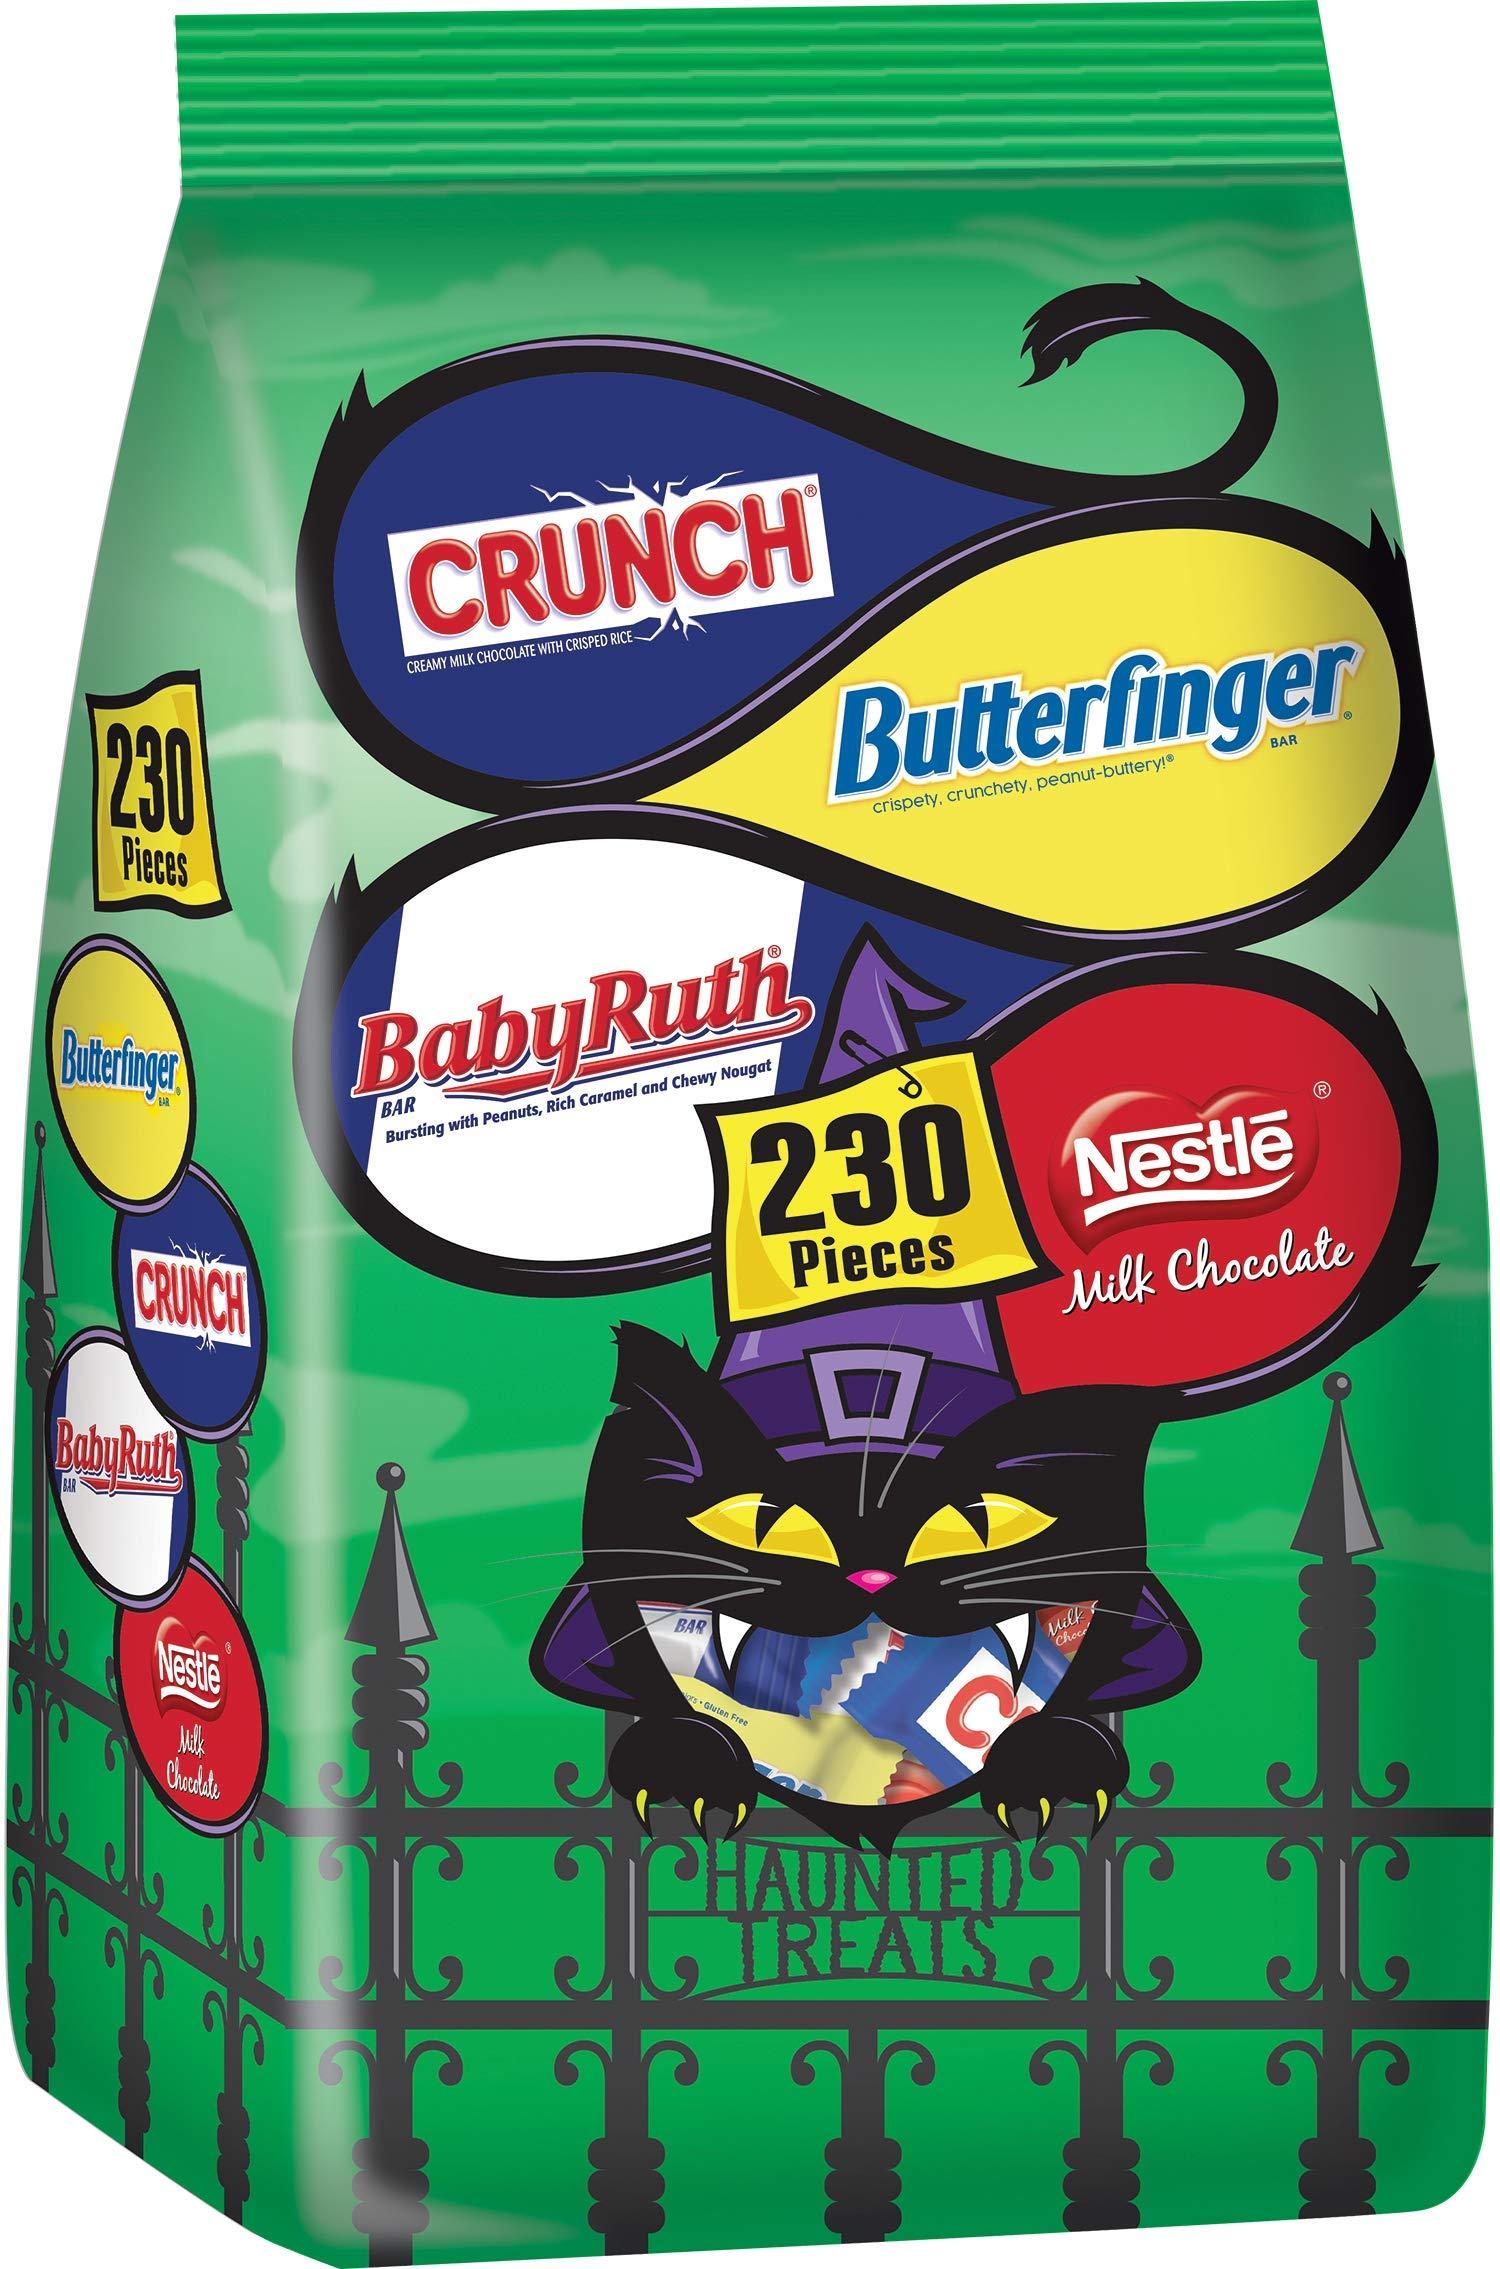 Nestle Assorted Bulk Chocolate Halloween Candy Bag, Fun Size Mix of Butterfinger, Crunch, Baby Ruth & Nestle Milk Chocolate Bars, 88 Ounce by Nestle